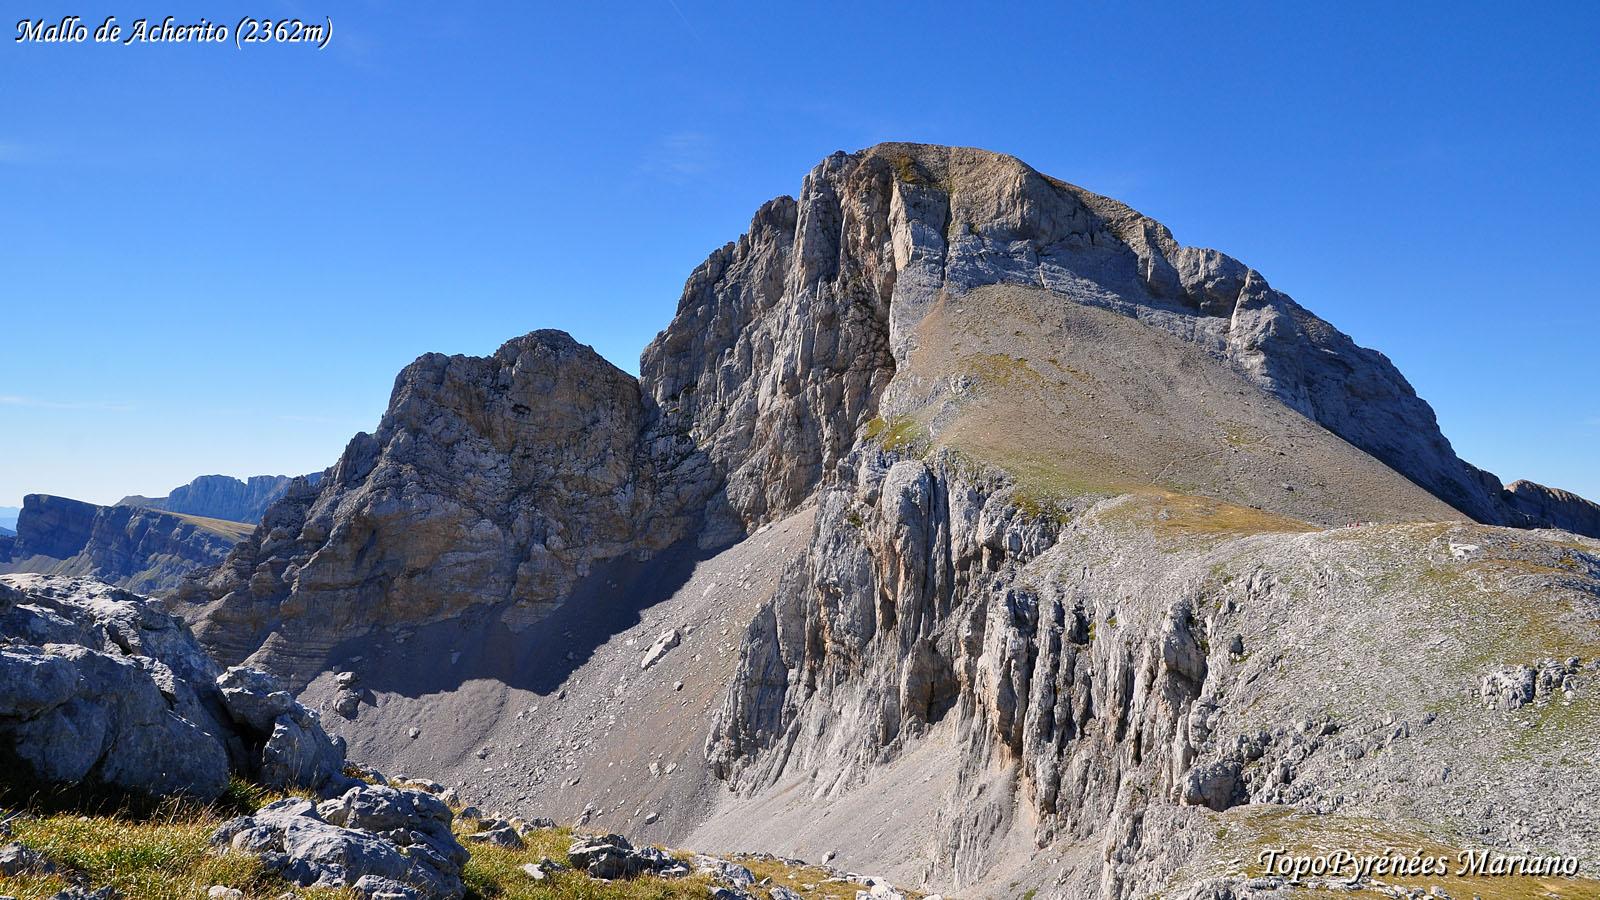 Randonnée Mallo de Acherito (2362m)